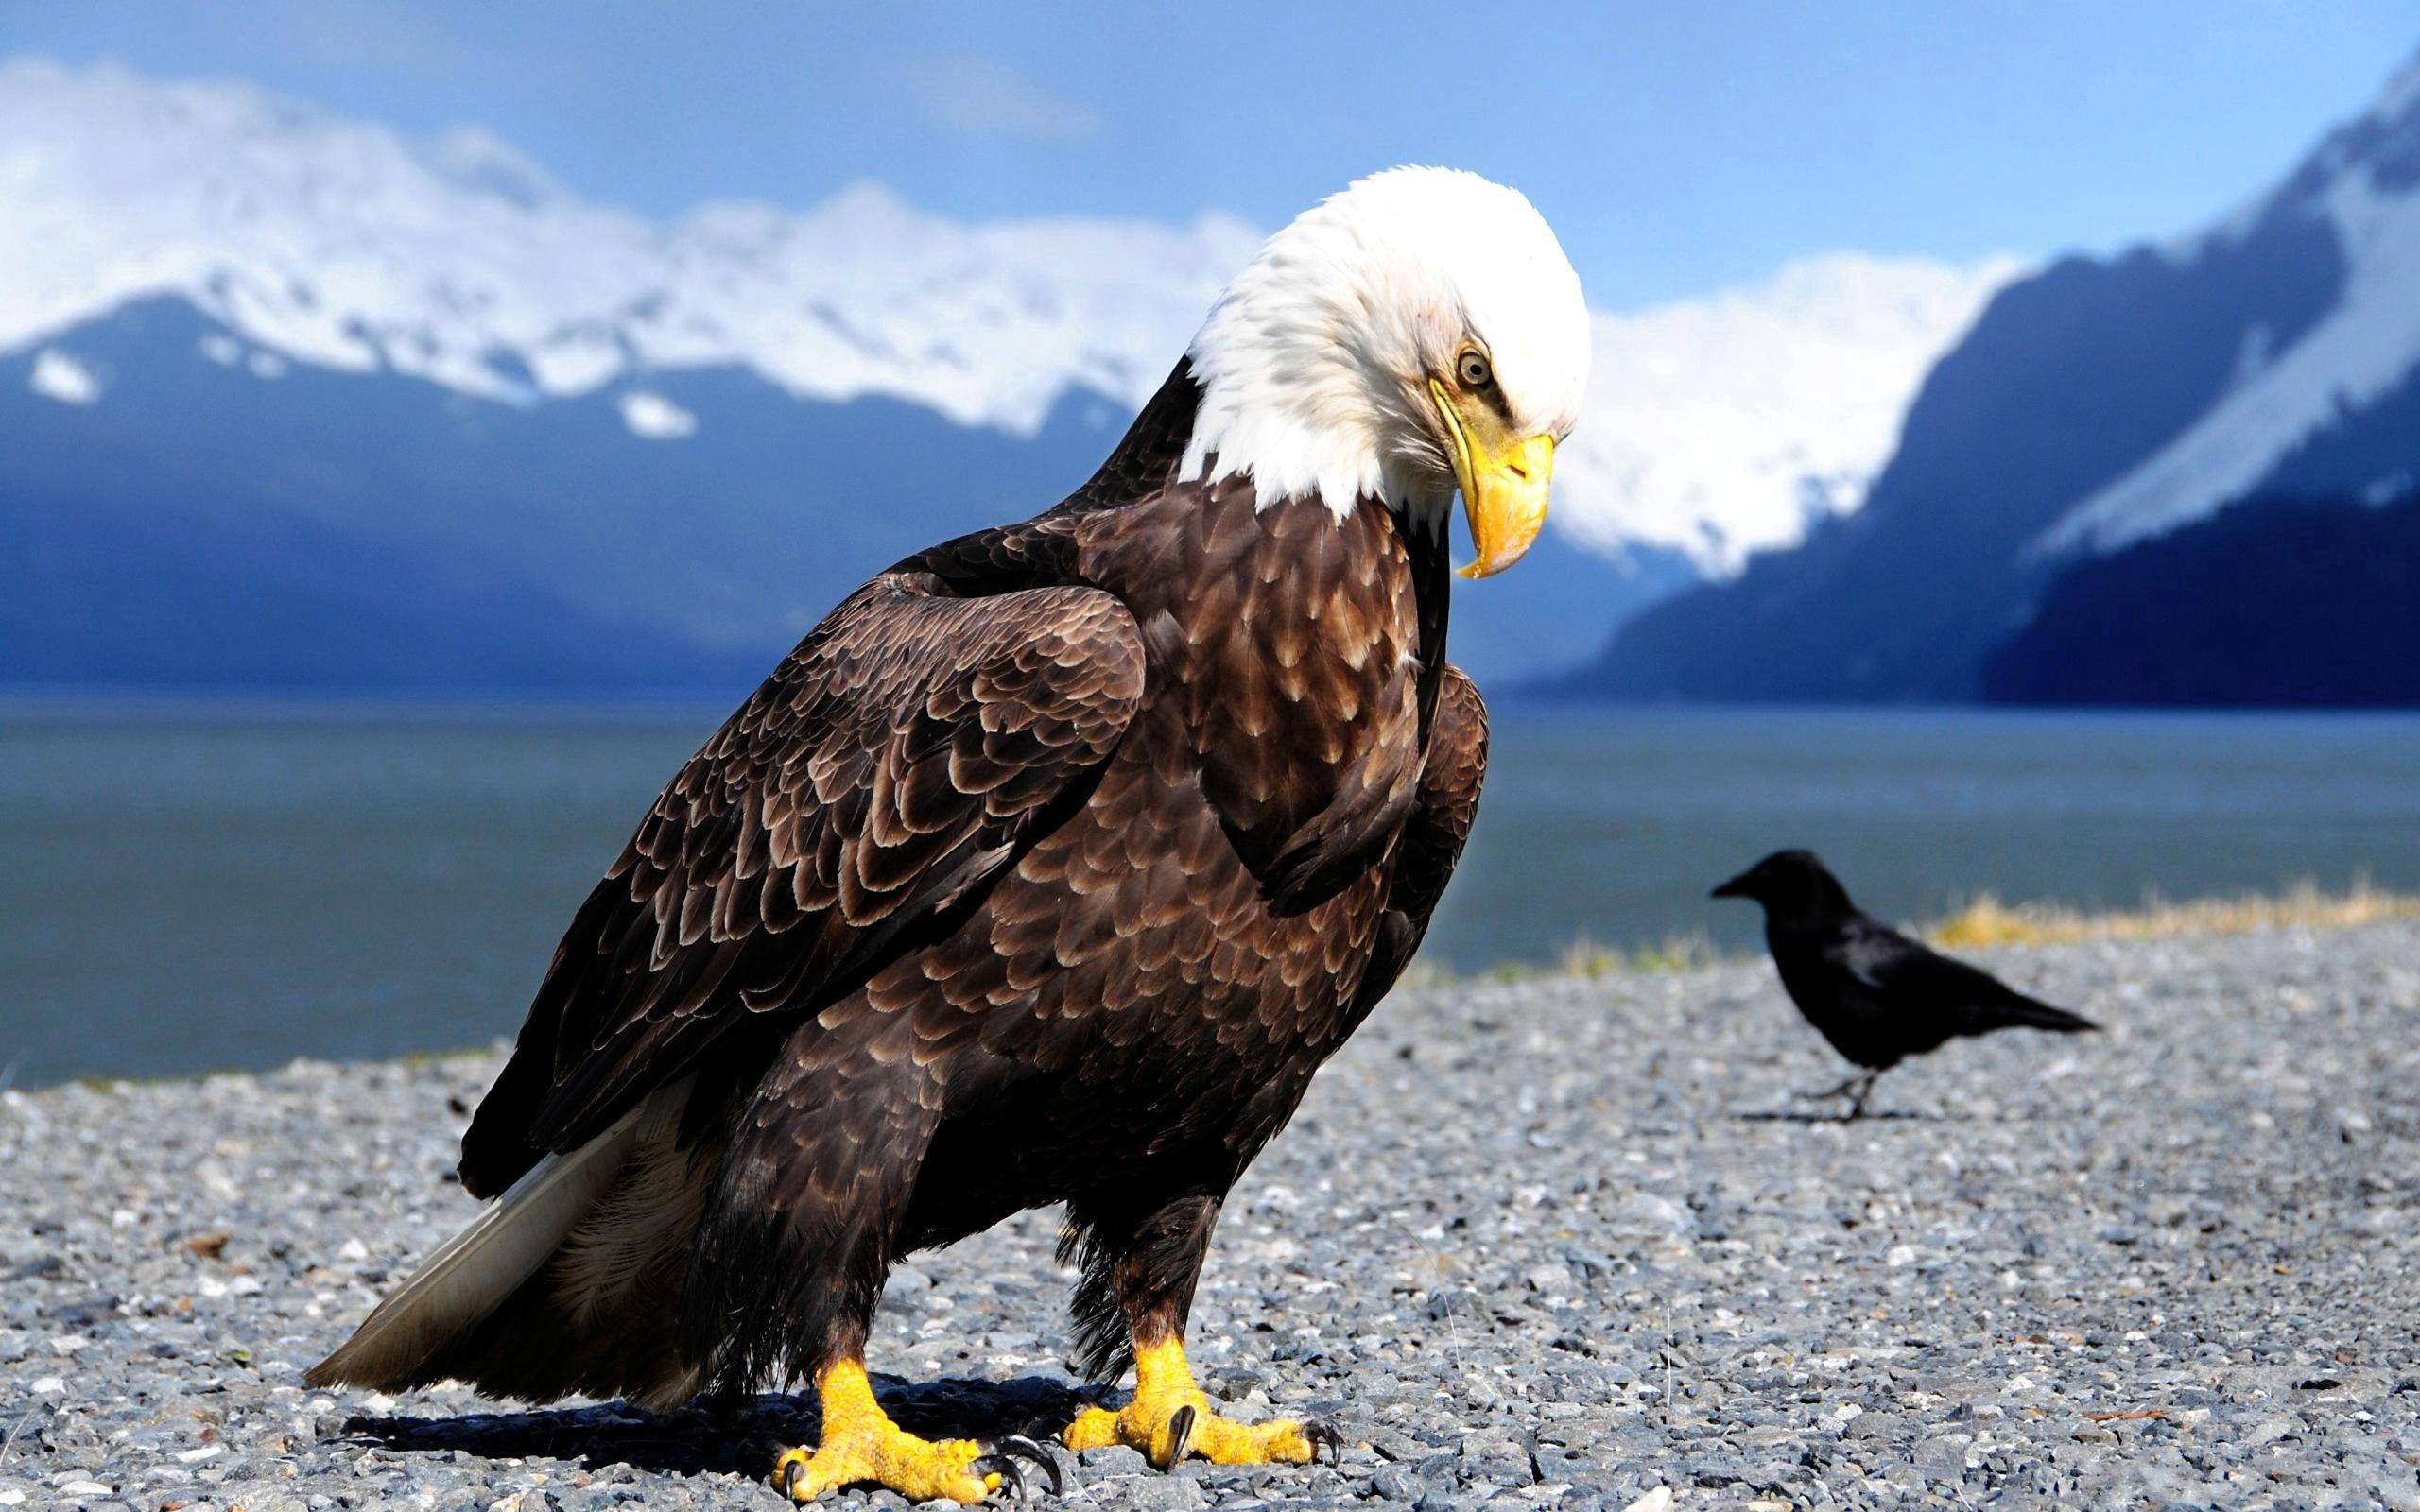 90010 descargar fondo de pantalla Animales, Águila, Cuervo, Orilla, Banco, Depredador, Birds: protectores de pantalla e imágenes gratis